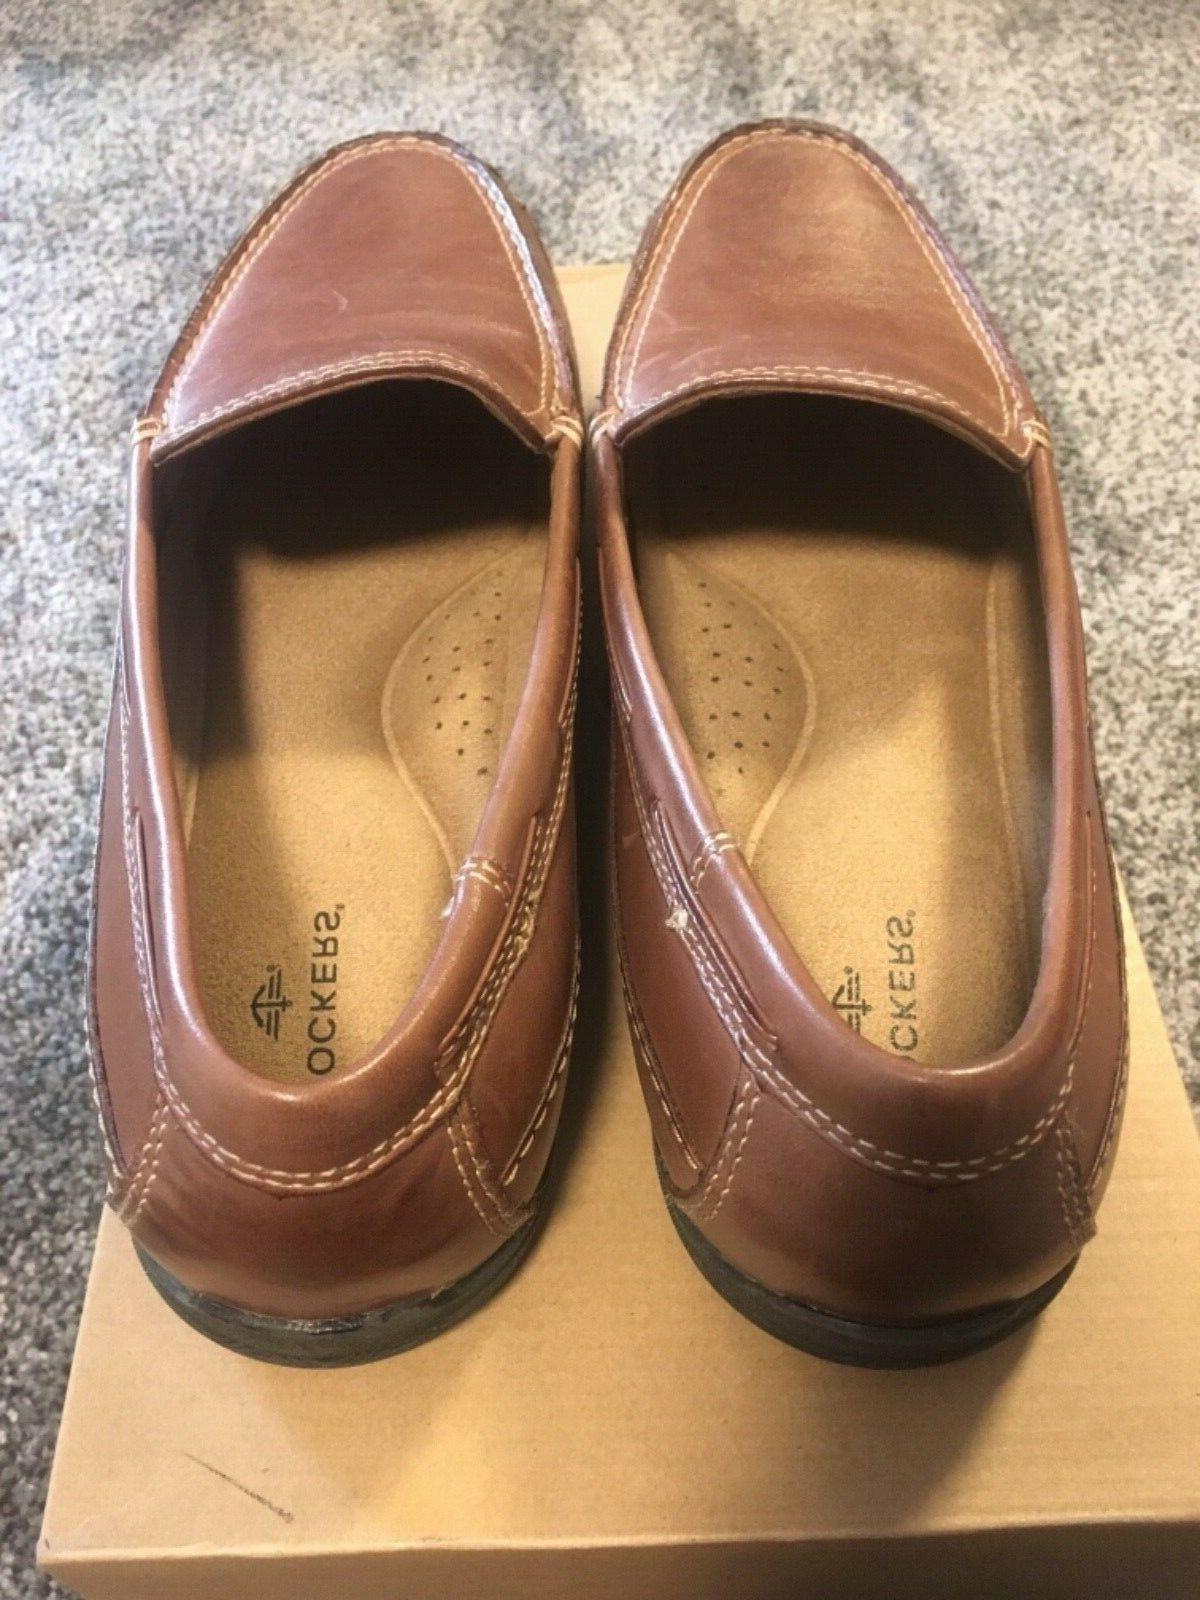 Dockers Men's Loafers 11.5